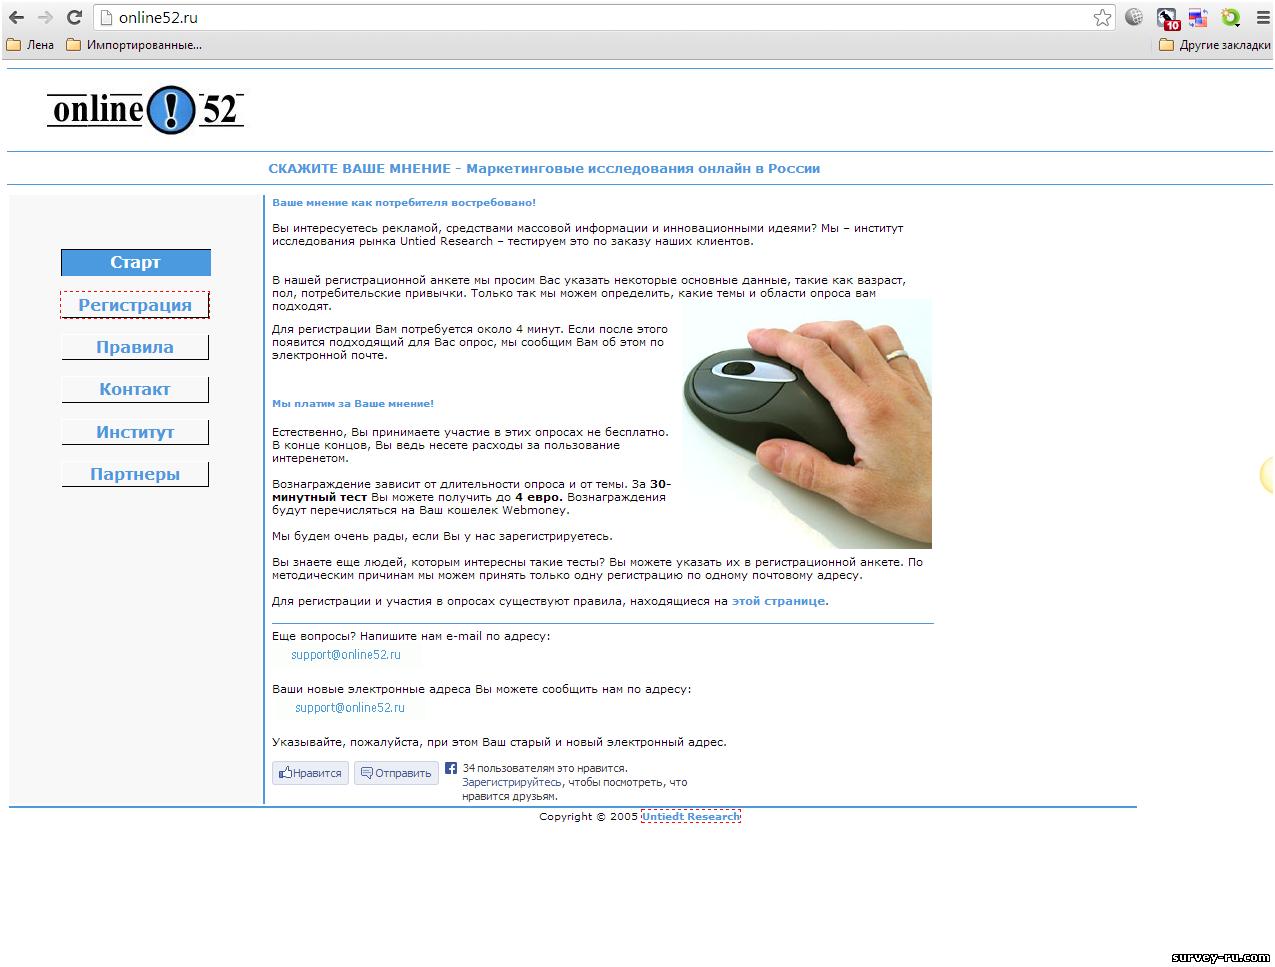 online52.ru - главная страница